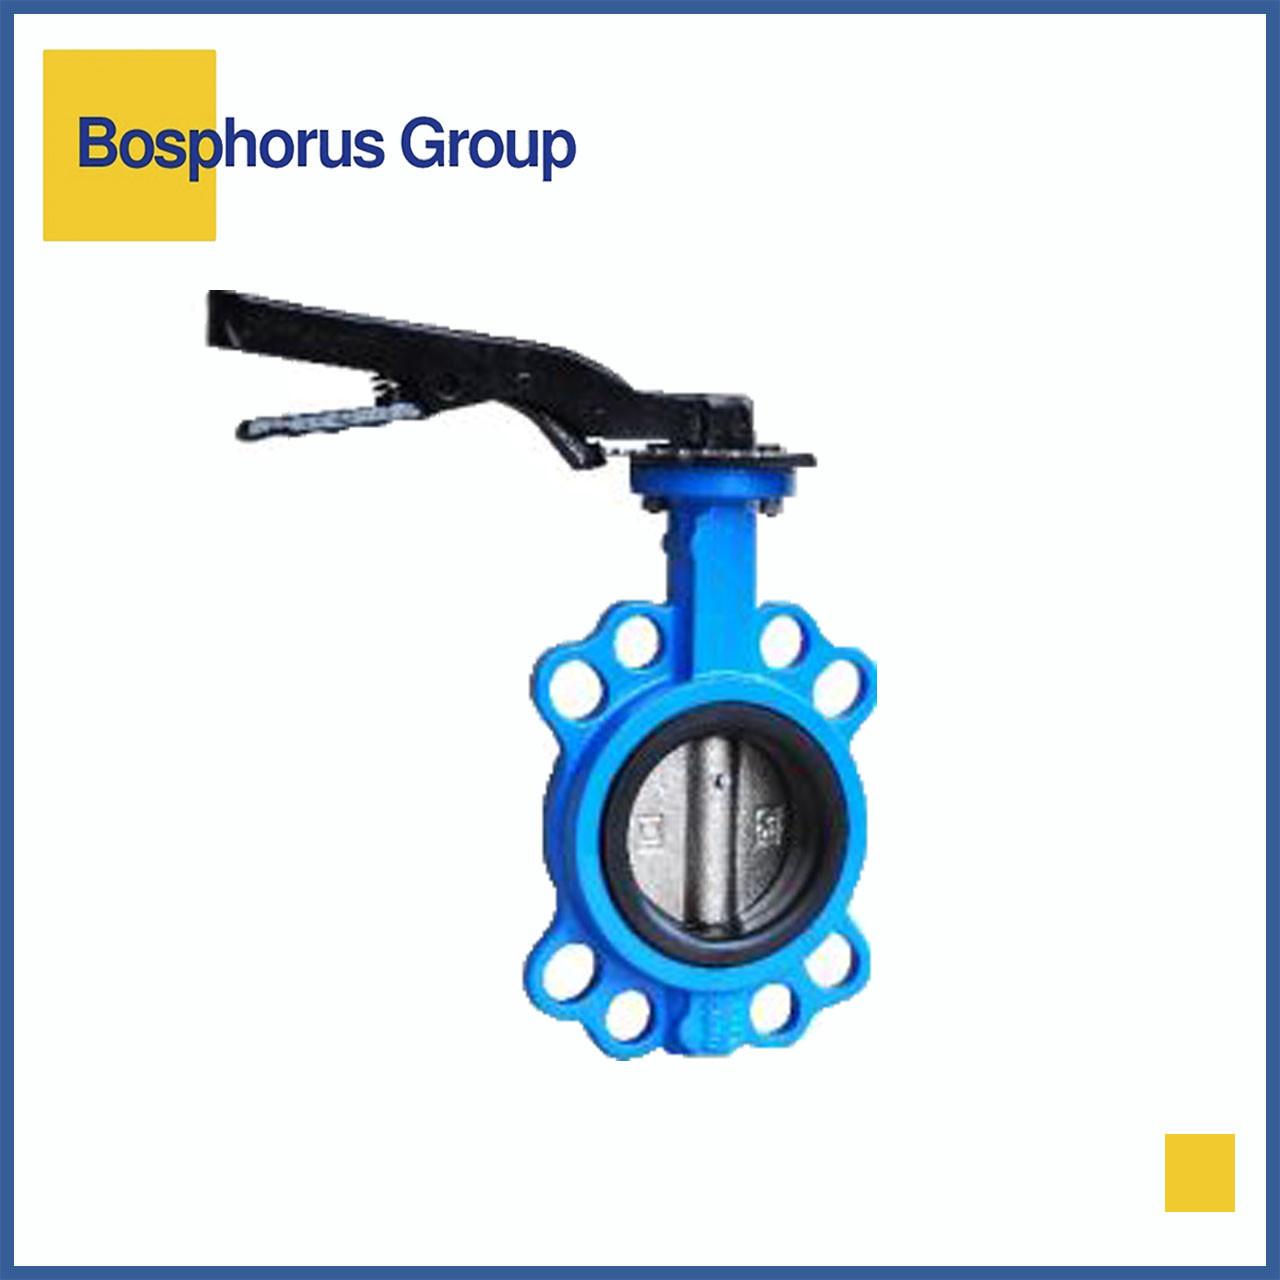 Затвор дисковый межфланцевый Ду65 Ру16, Brandoni (вода, +120)